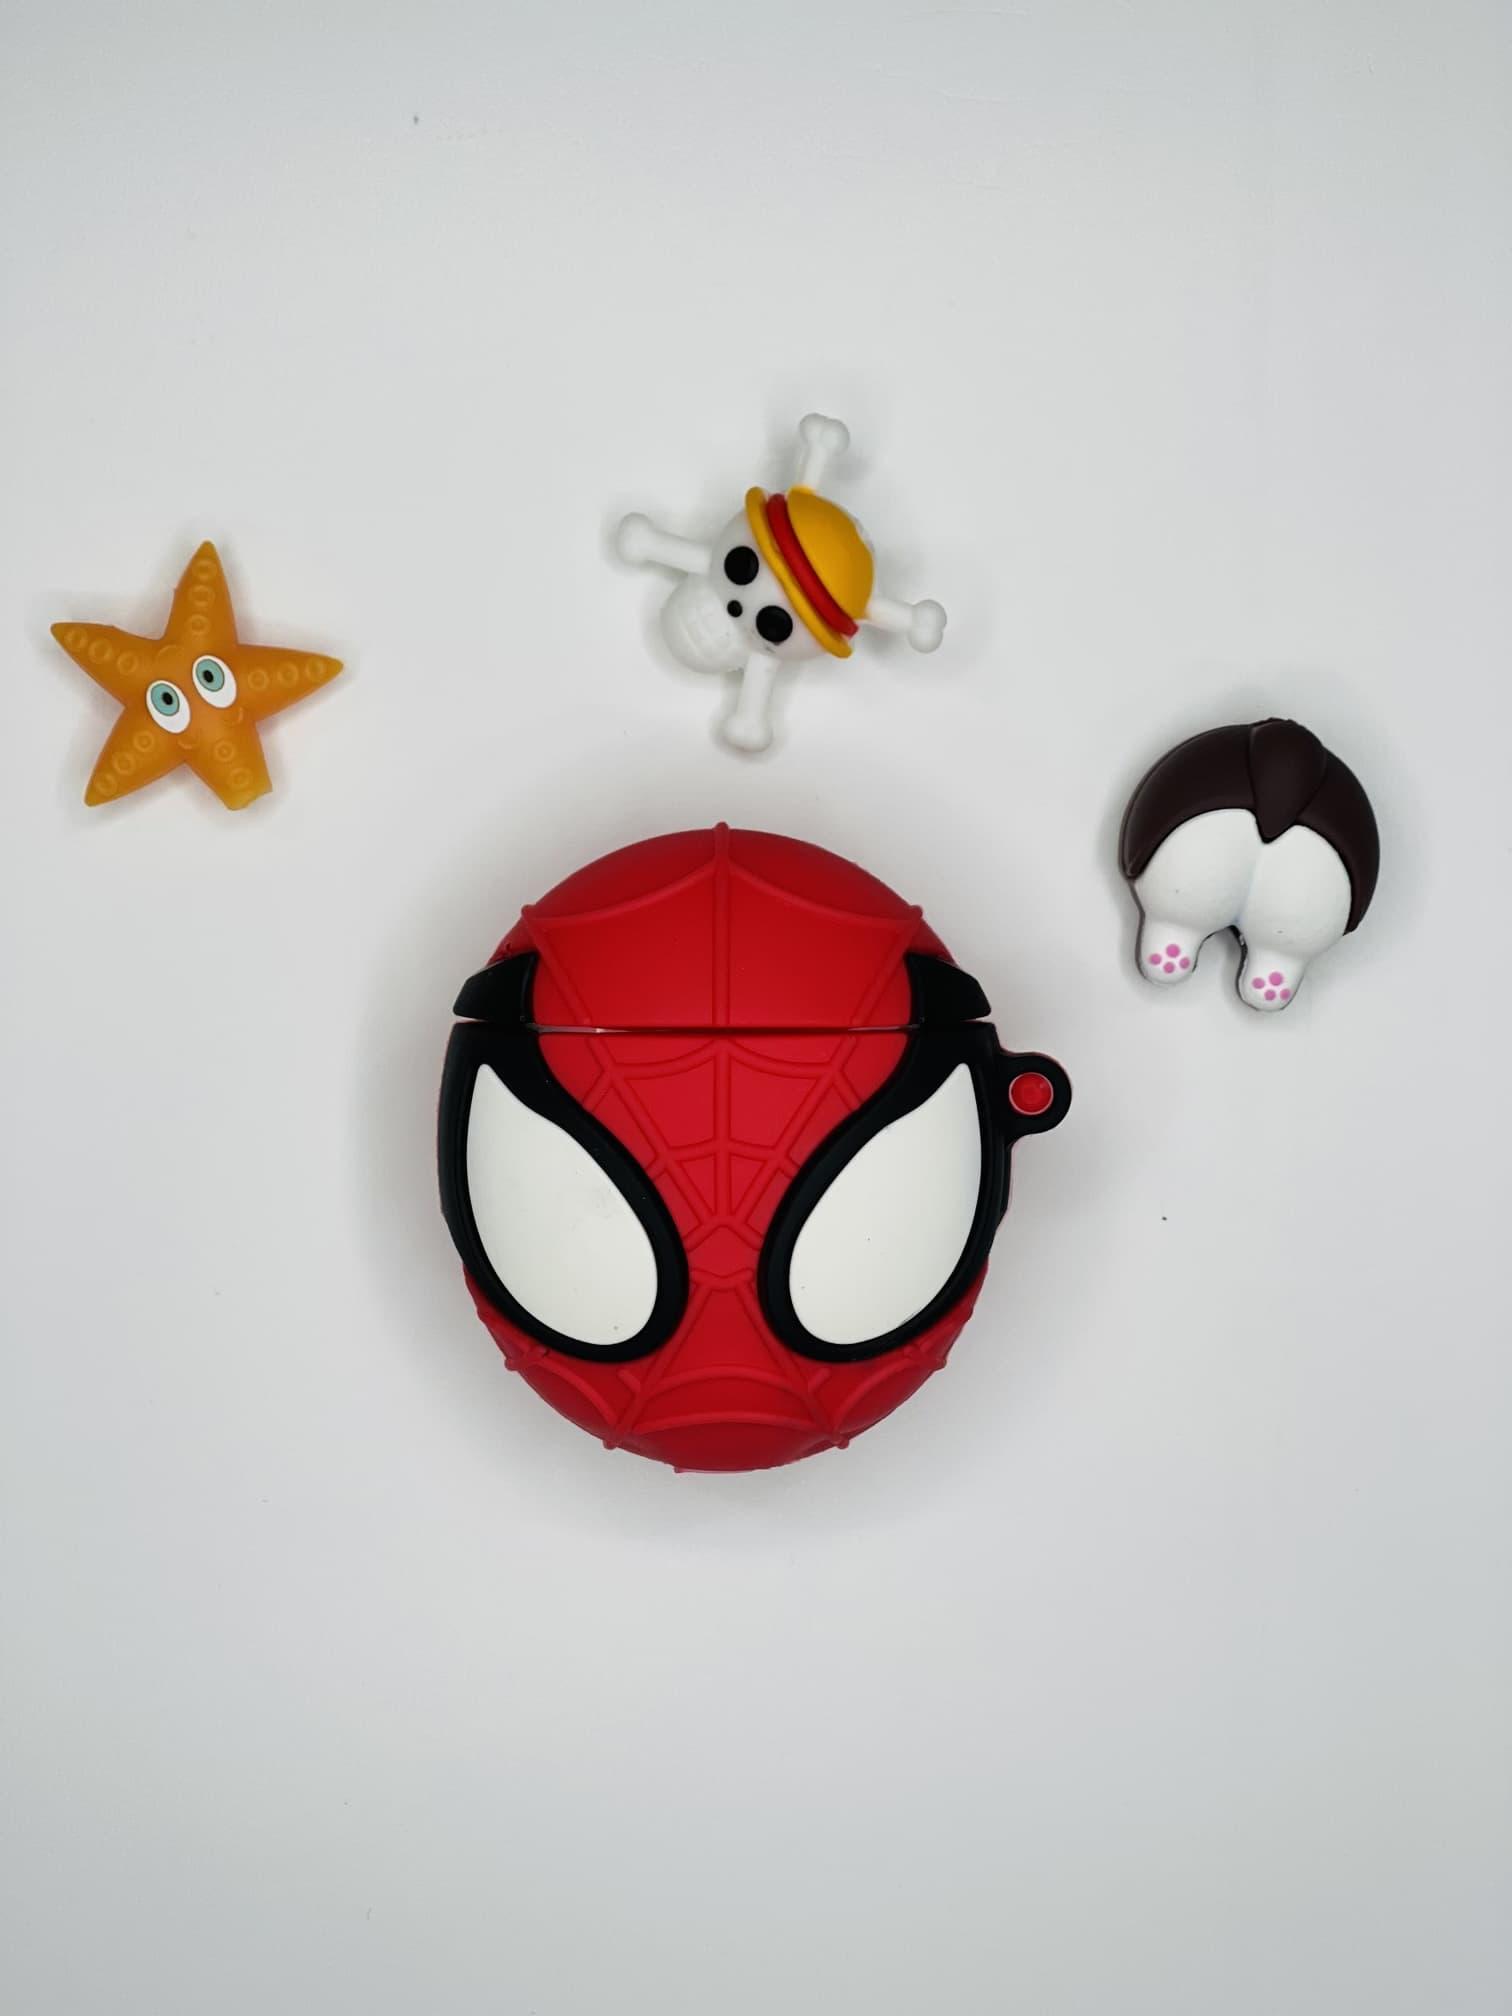 Spiderman Figürlü AirPods 2 Kılıfı